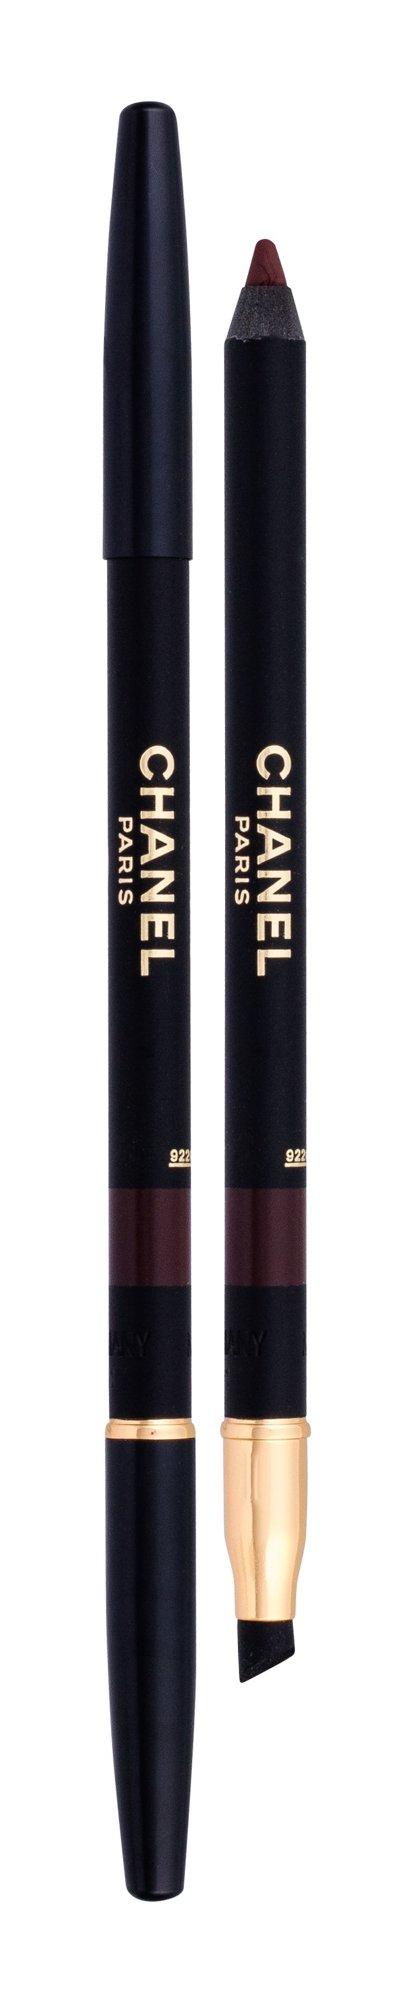 Chanel Le Crayon Yeux Eye Pencil 1ml 67 Prune Noire